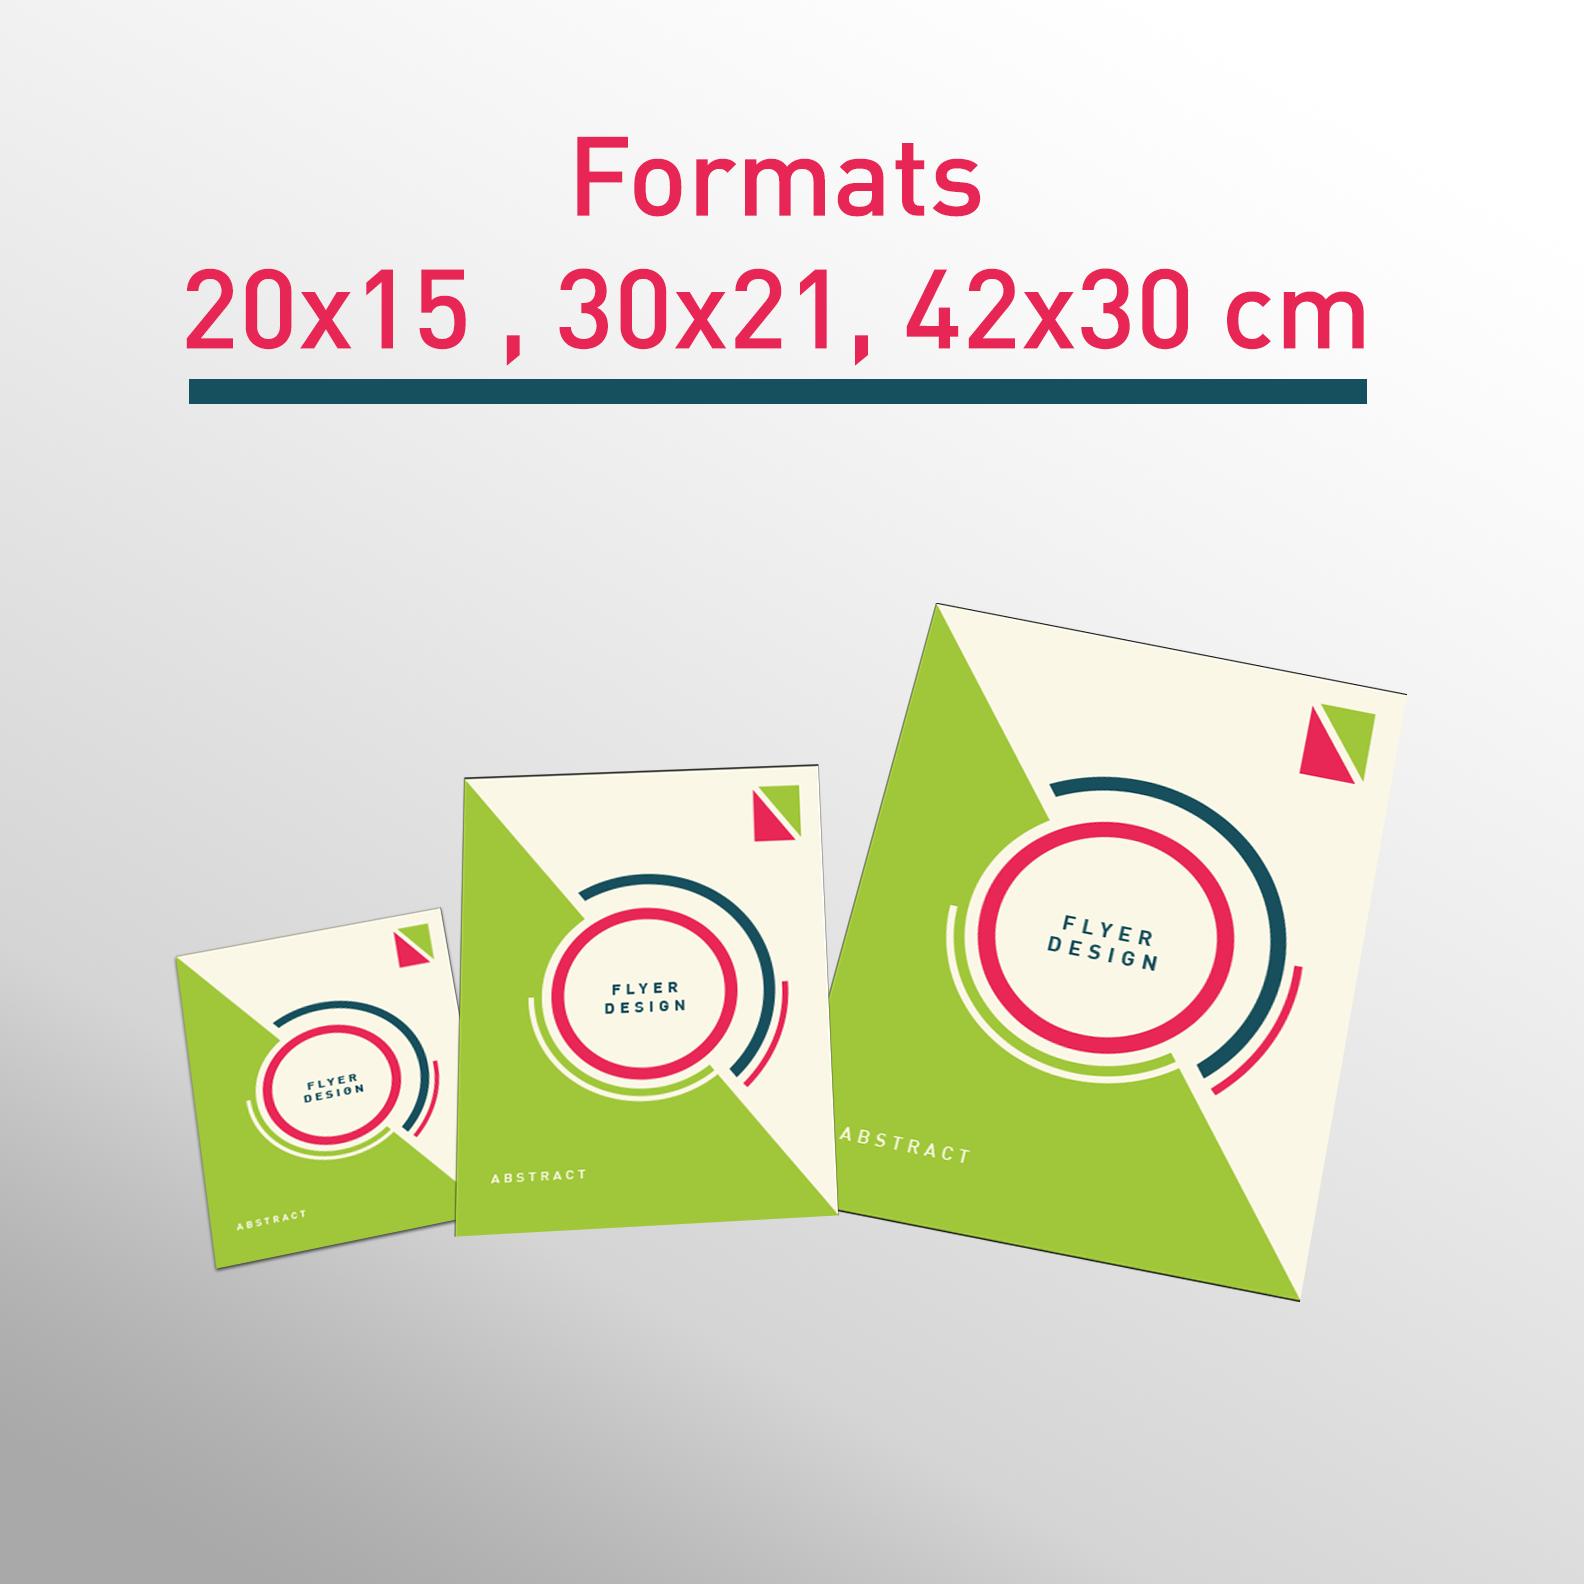 Les formats flyers A5 -A4 -A3